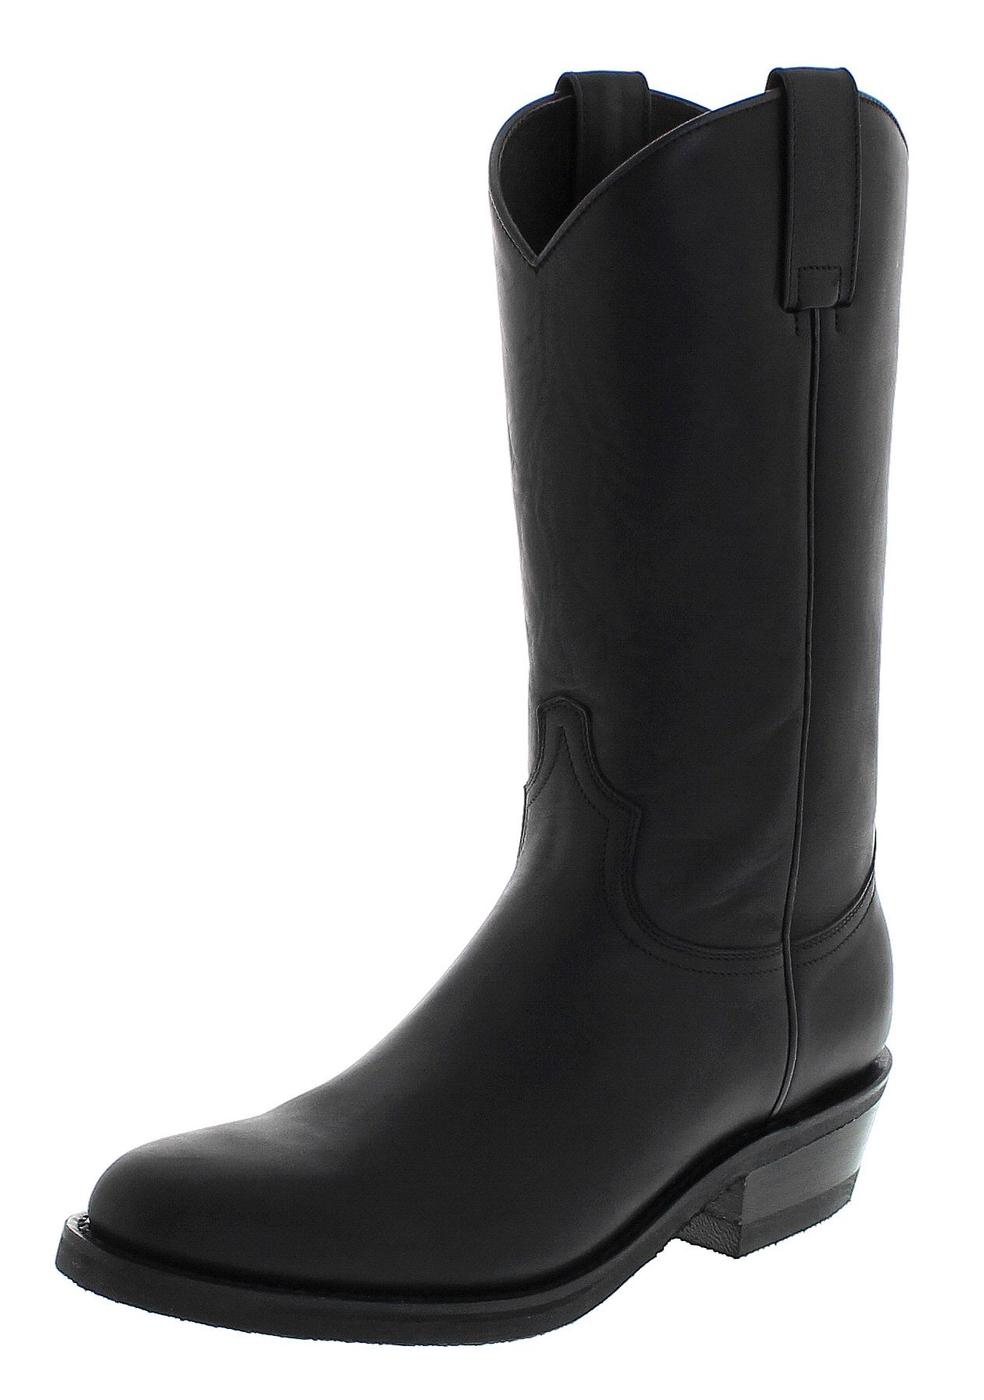 Sendra Boots 5588 Sprinter Negro Herren Westernstiefel - schwarz